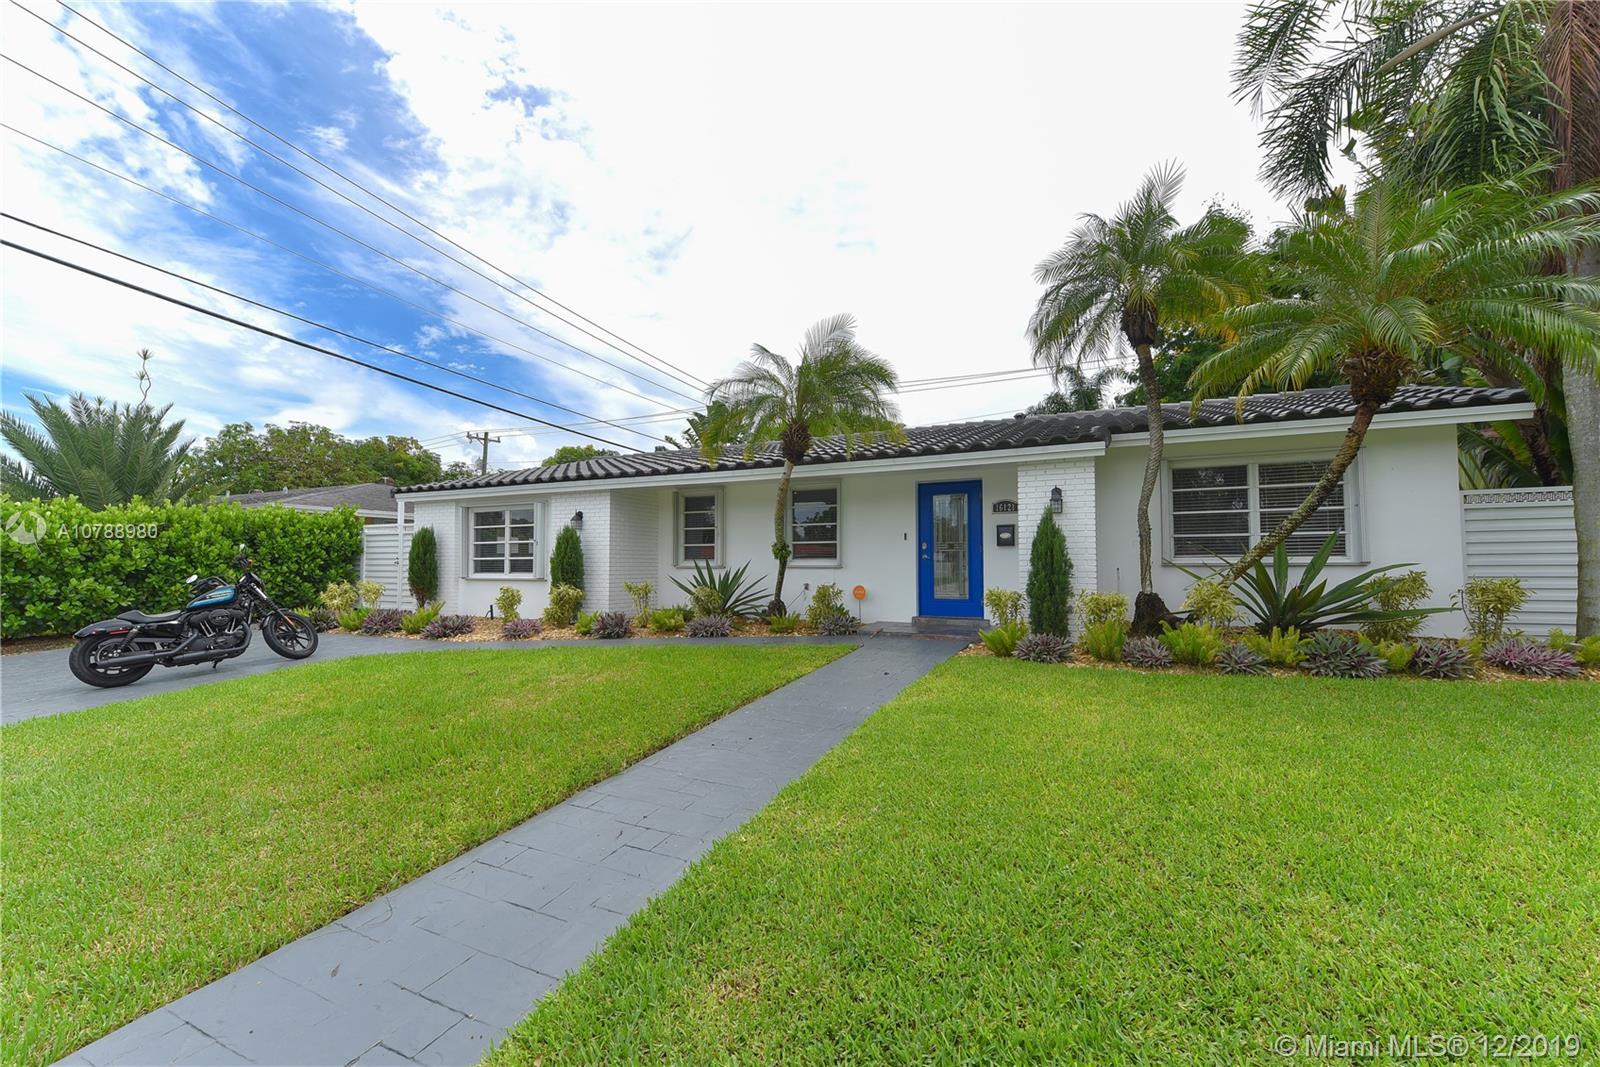 16121 SW 102nd Ave, Miami FL 33157